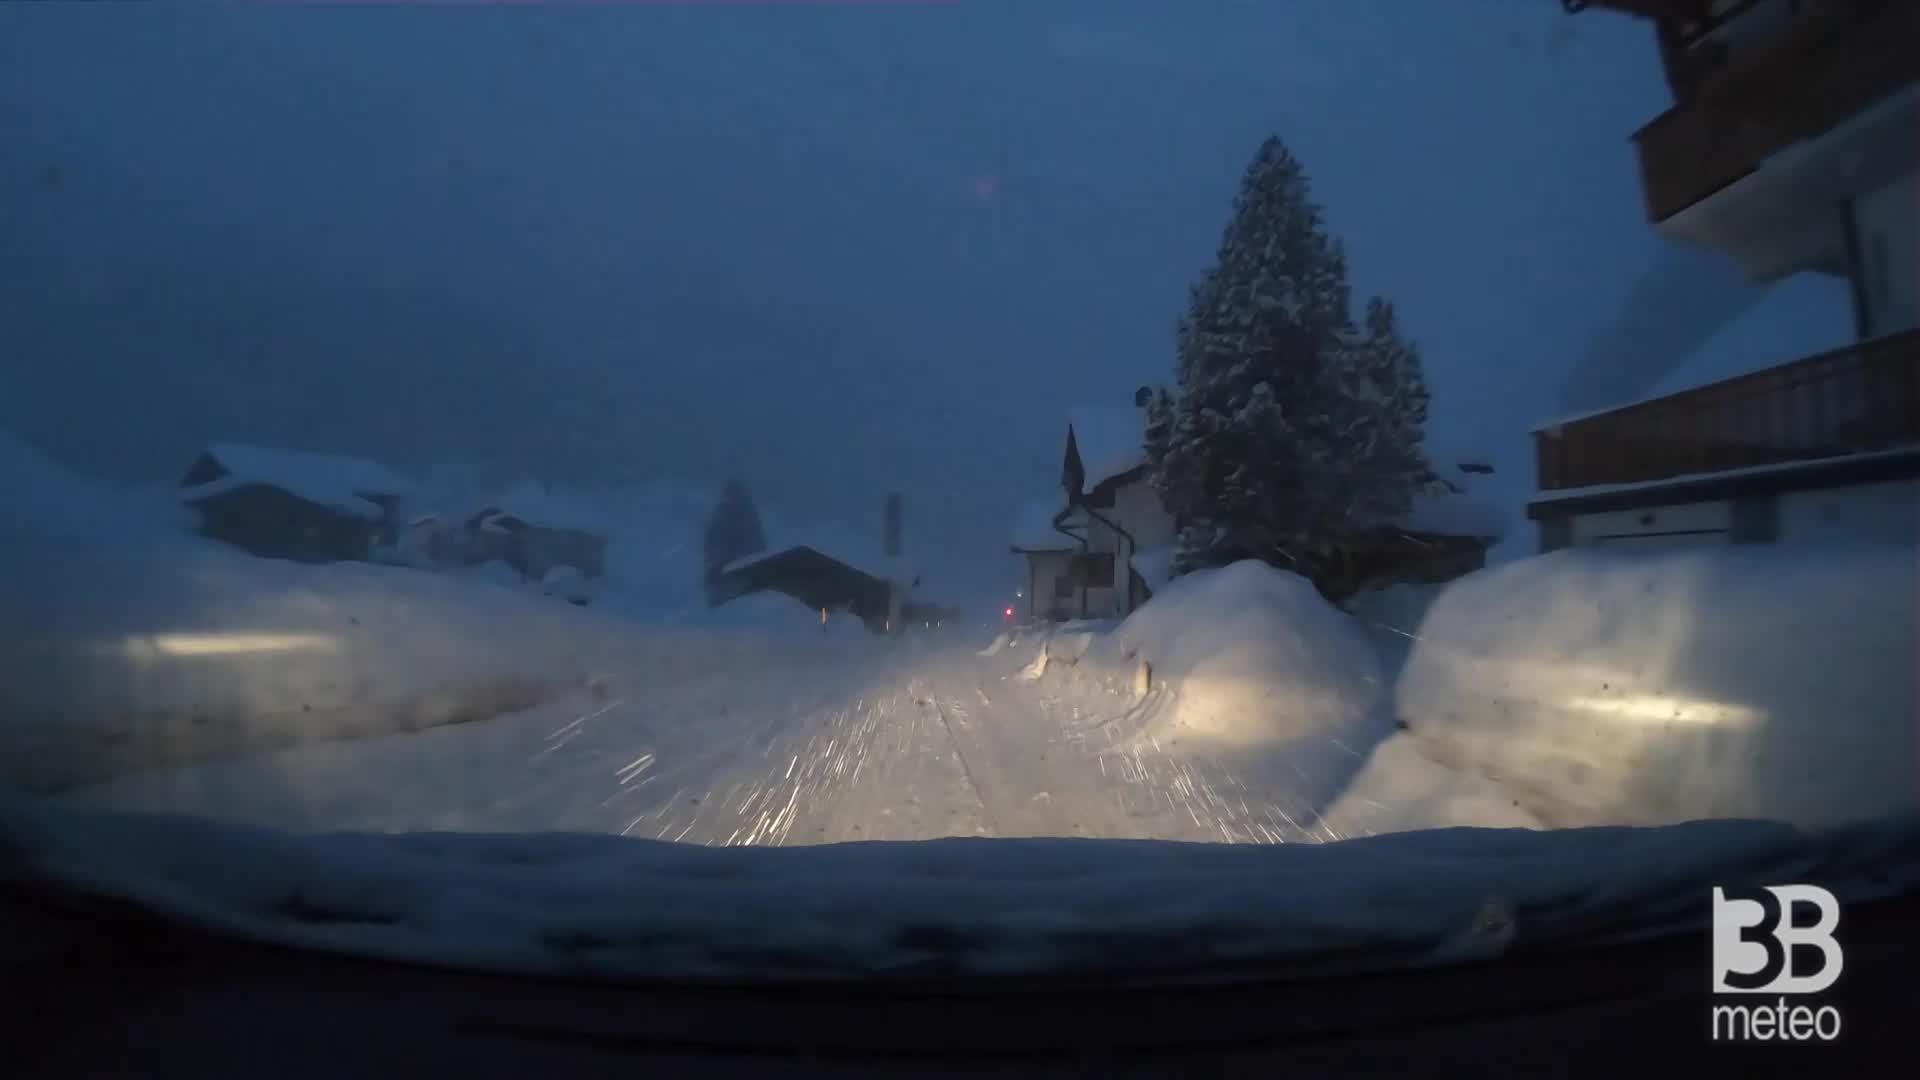 Immagine 1:METEO ALPI | Situazione critica in Valle Aurina (BZ), sepolta da oltre un metro di *NEVE [VIDEO]